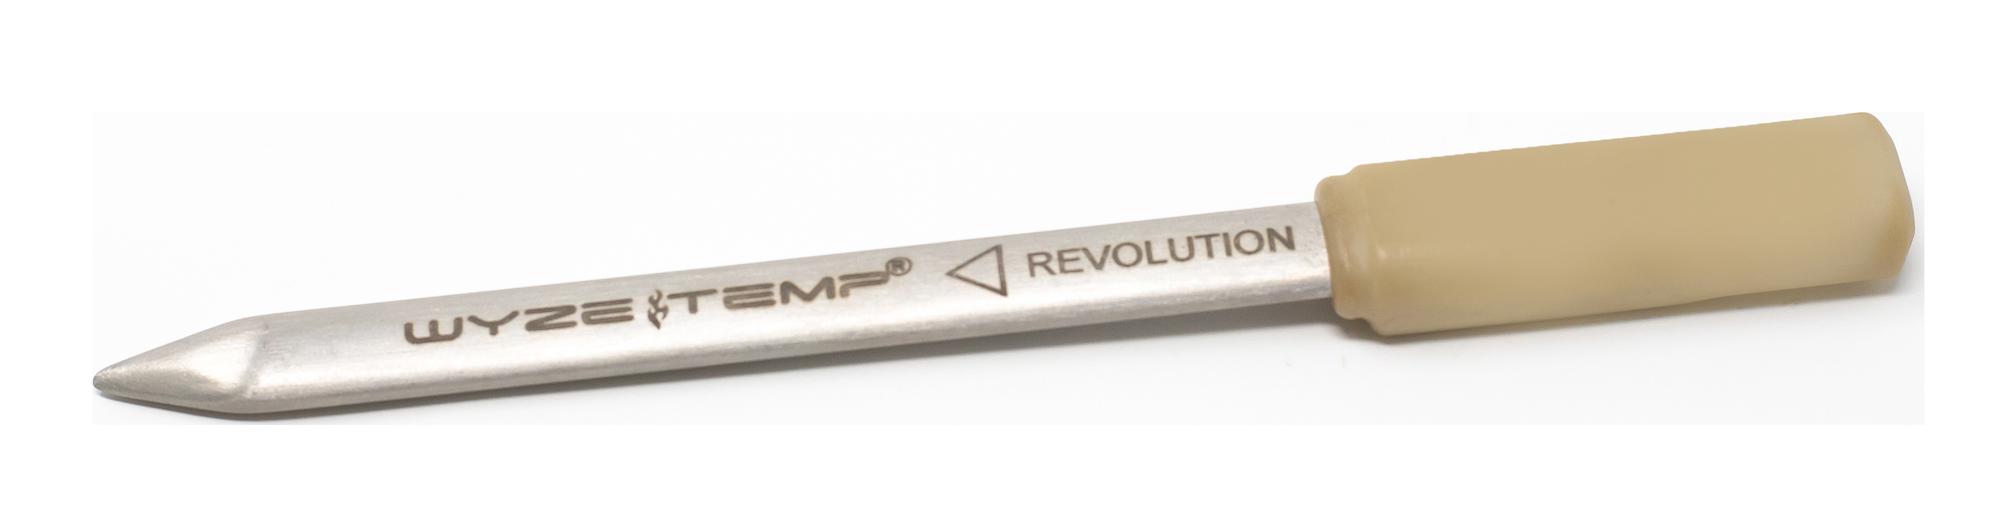 Wyze Temp Revolution rotisserie temp sensor